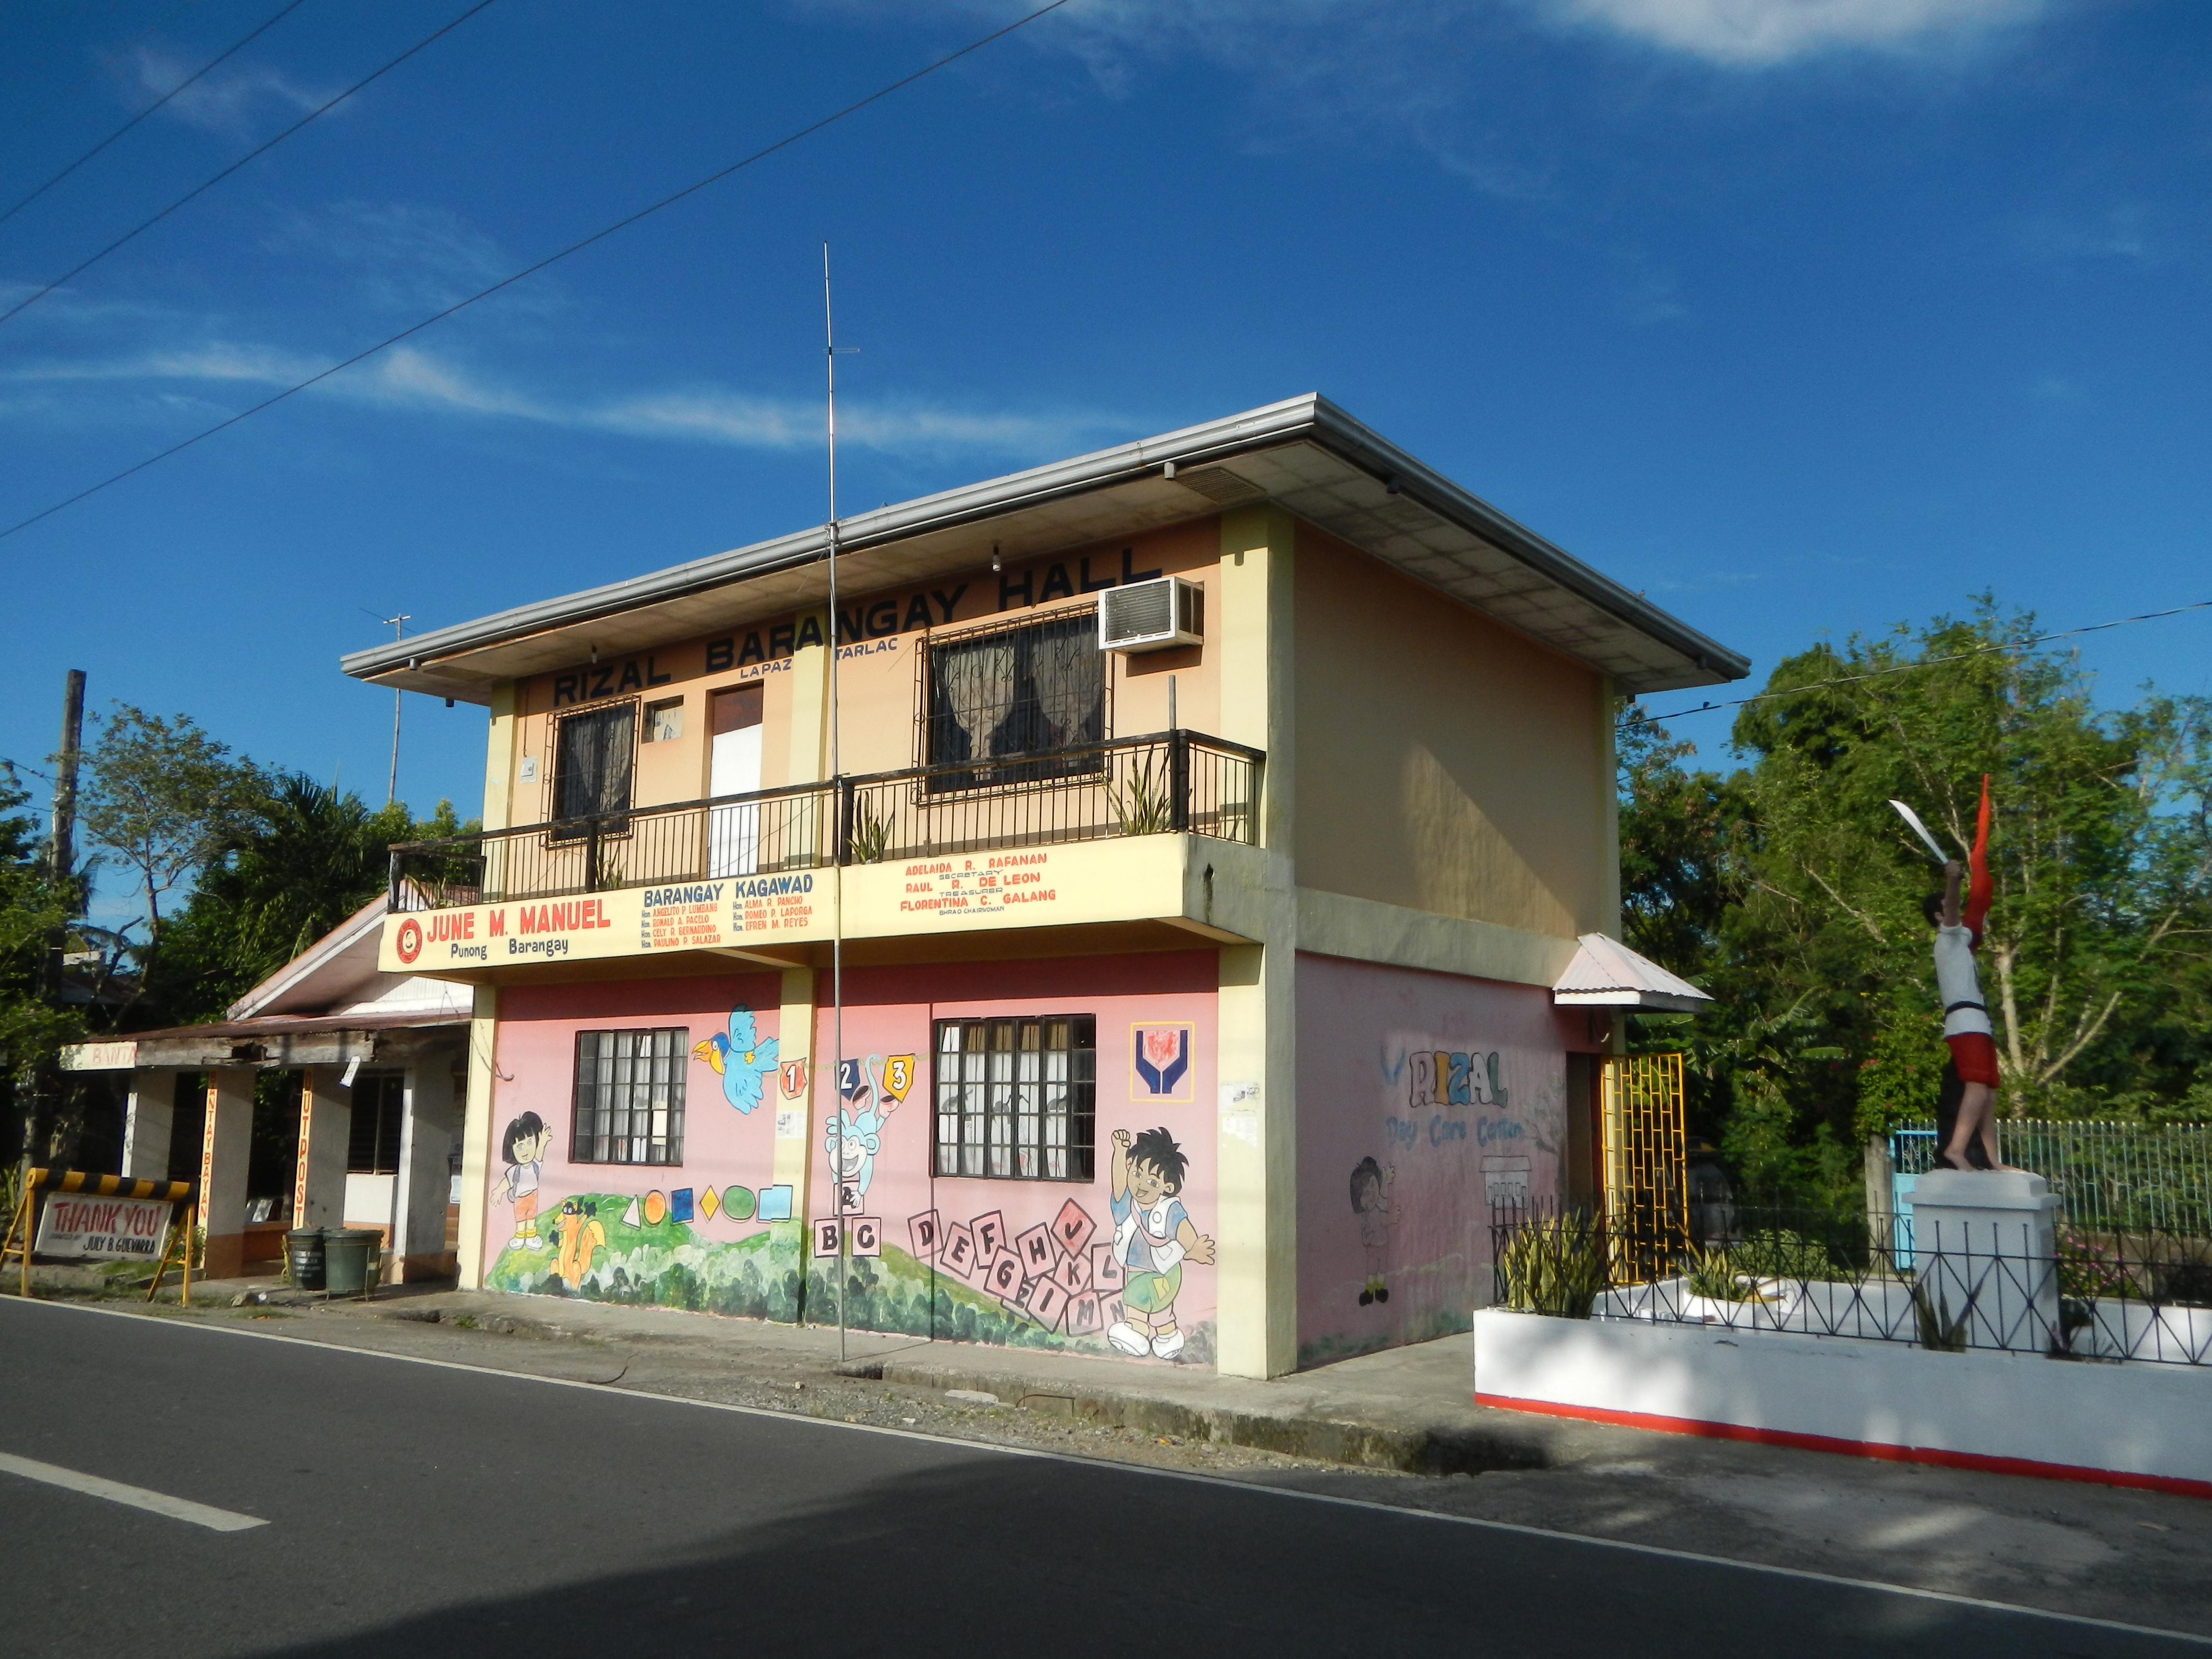 File:7605jfRizal Balanoy La Paz Hall Roads Tarlacfvf 17 ...